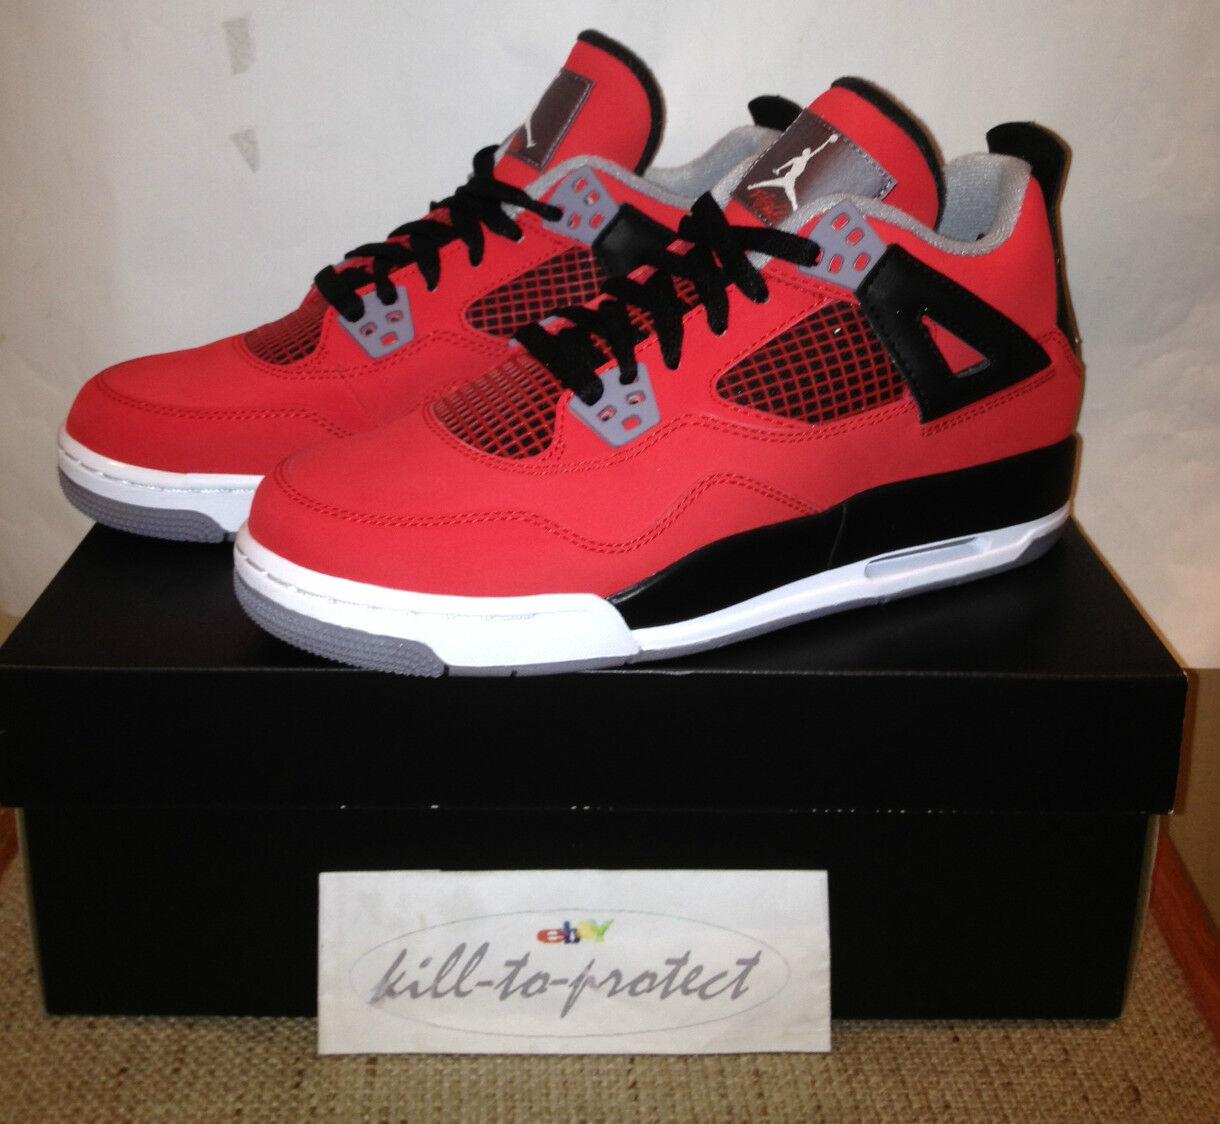 Nike jordan 4 toro bravo red mila bambini sz y 5y 6y db raging 408452-603